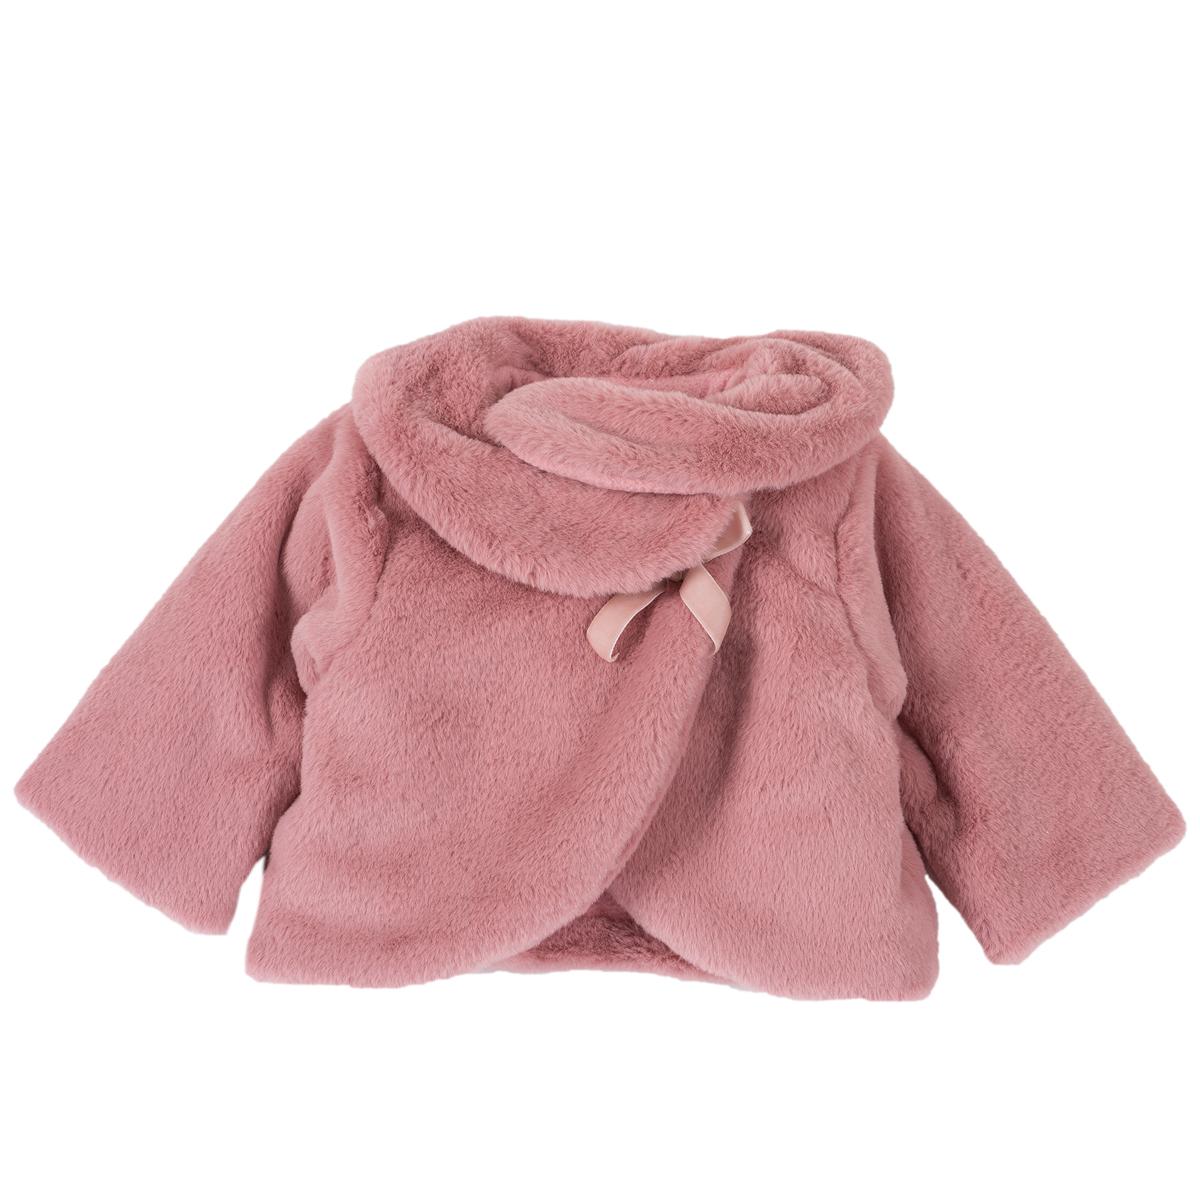 Jacheta copii Chicco, blanita sintetica, 82383 din categoria Jachete copii